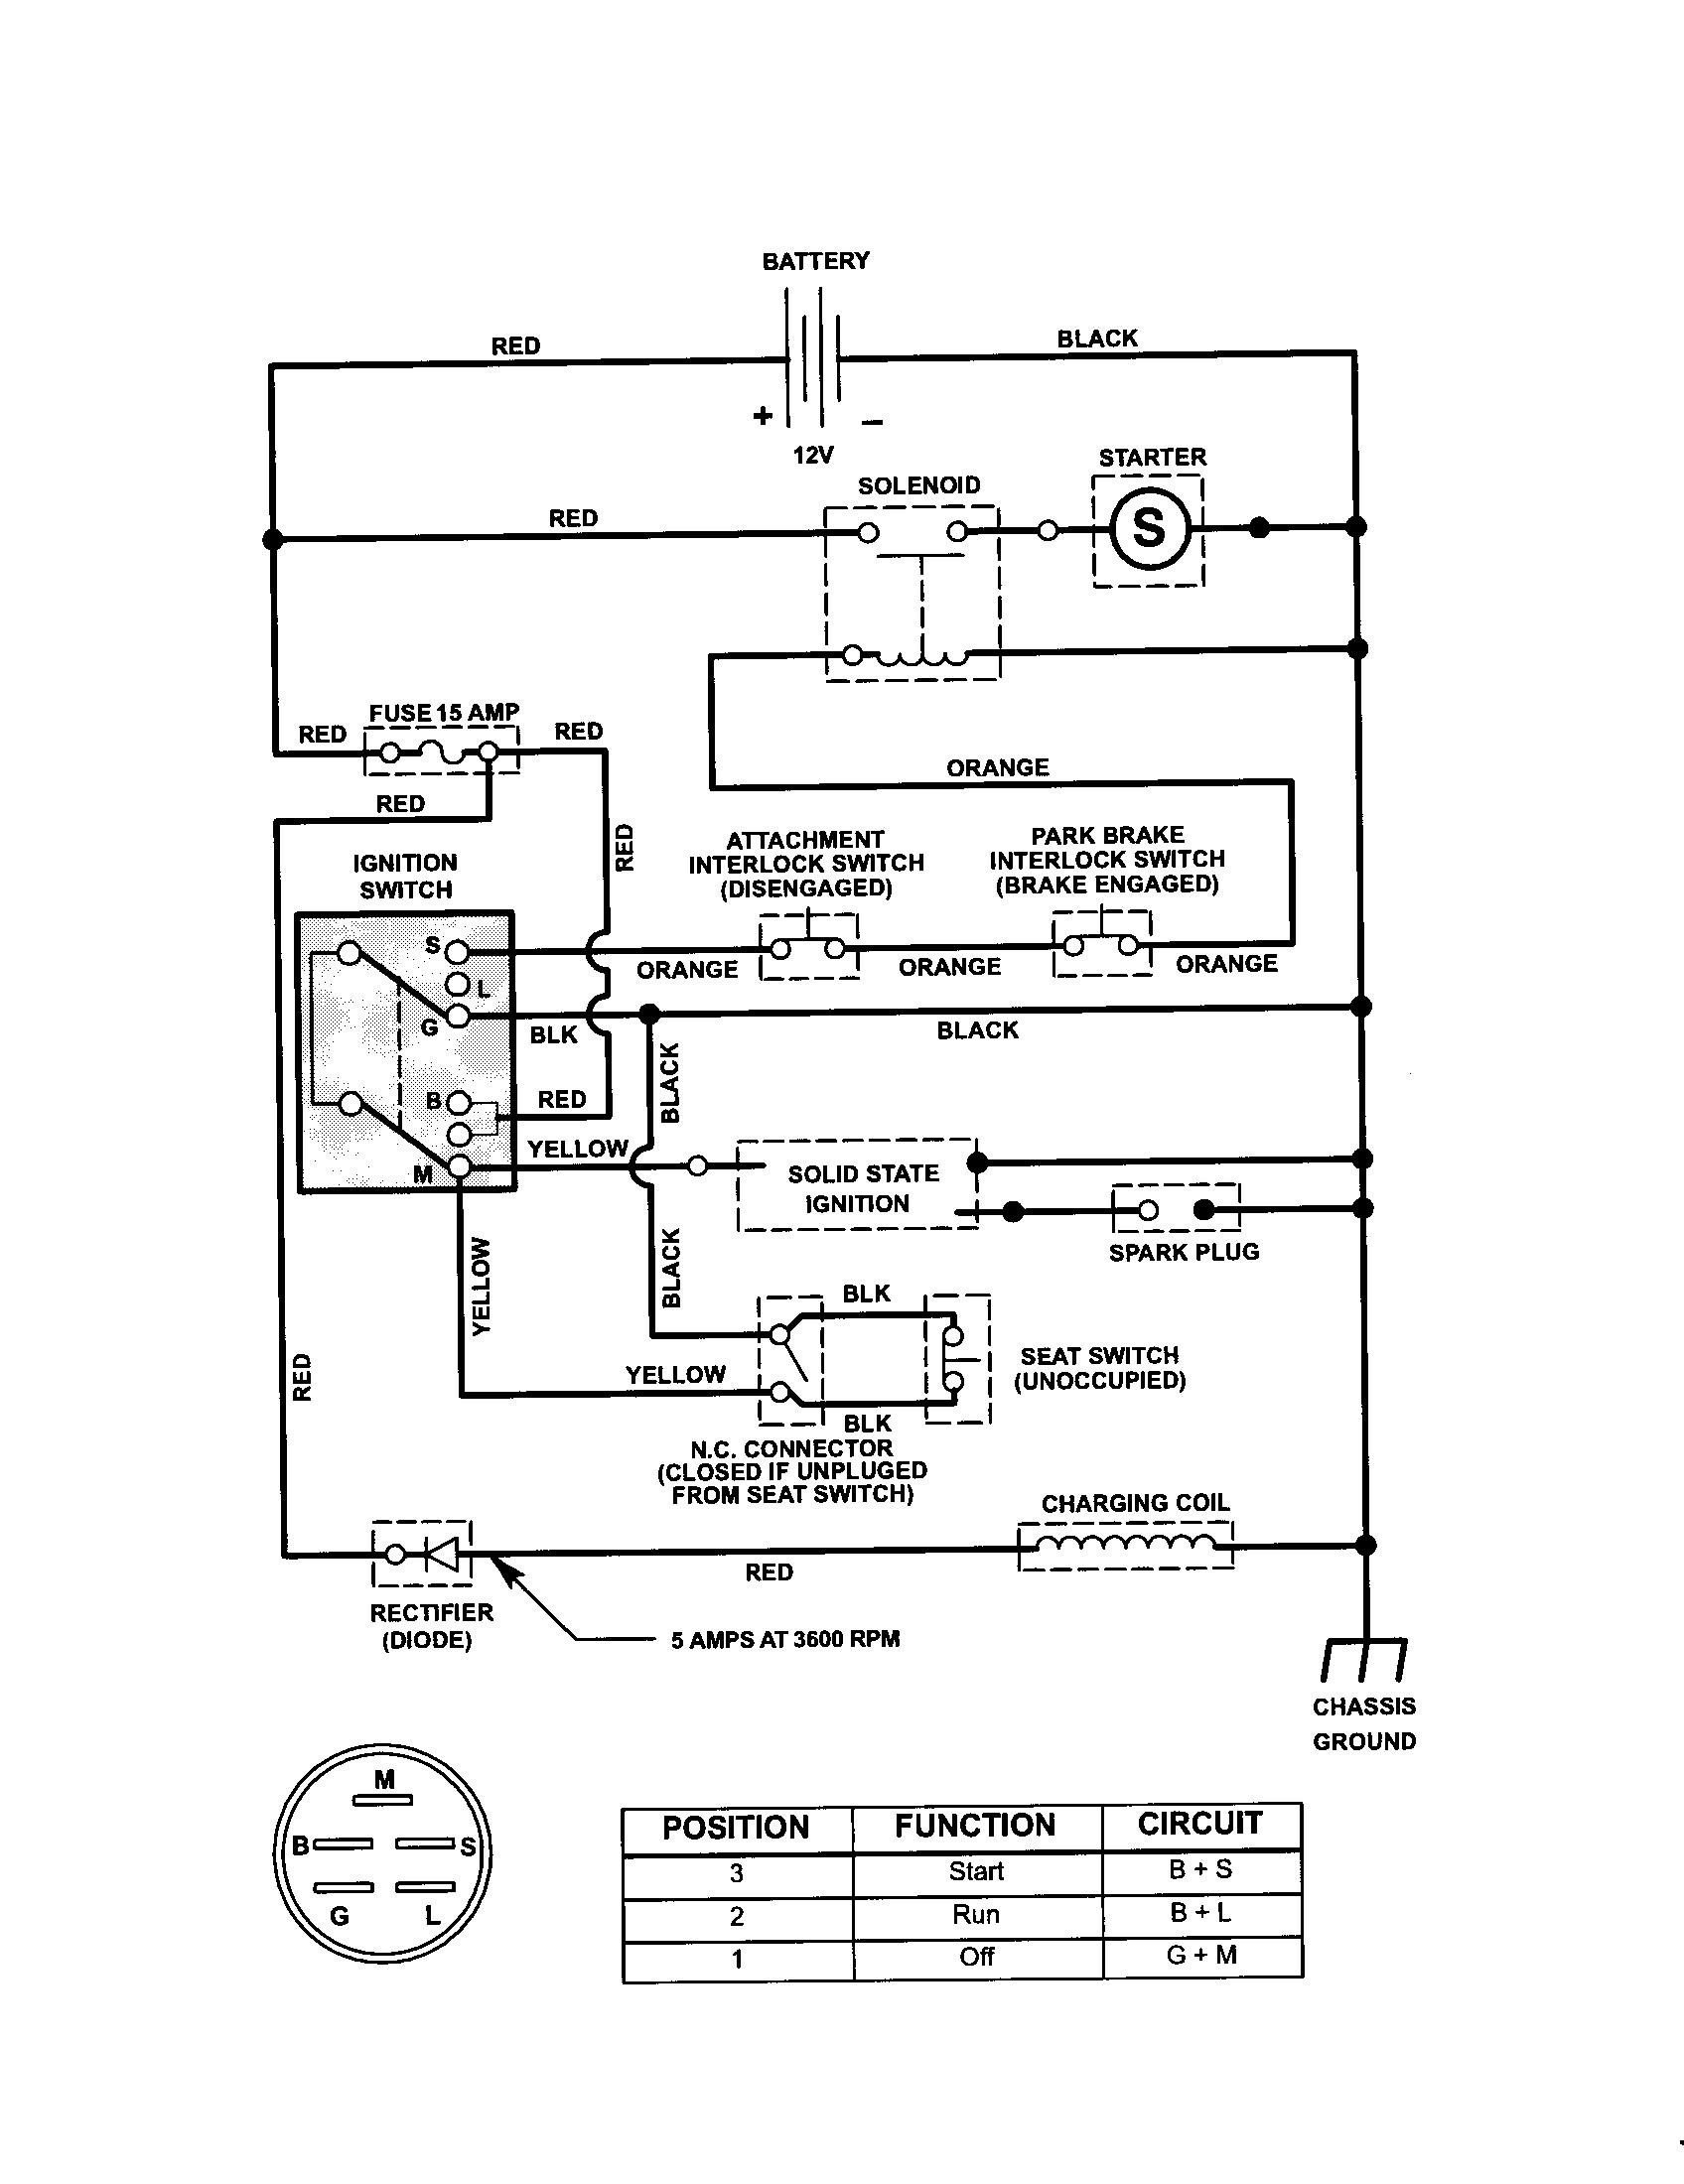 Wiring Diagram for Craftsman Riding Lawn Mower Lovely Craftsman Riding Mower Electrical Diagram